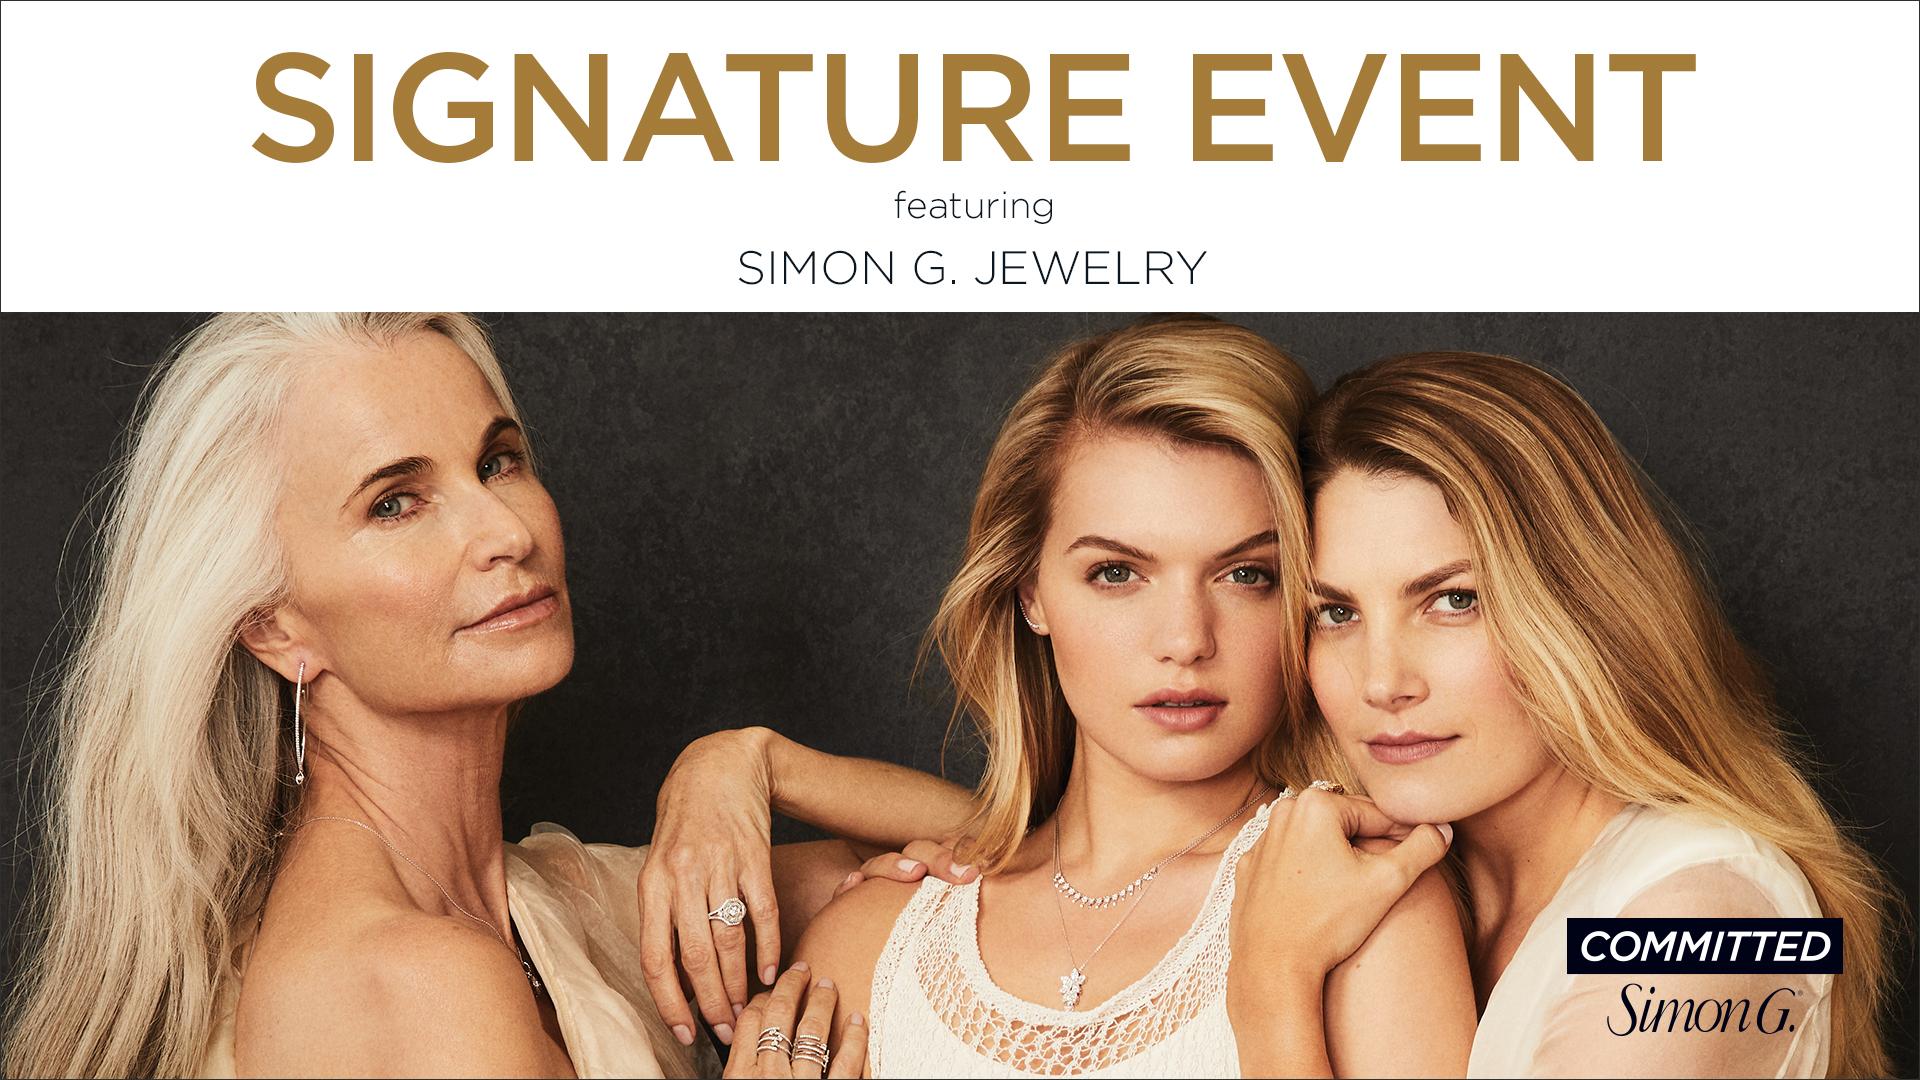 Signature Event at Ackerman Jewelers